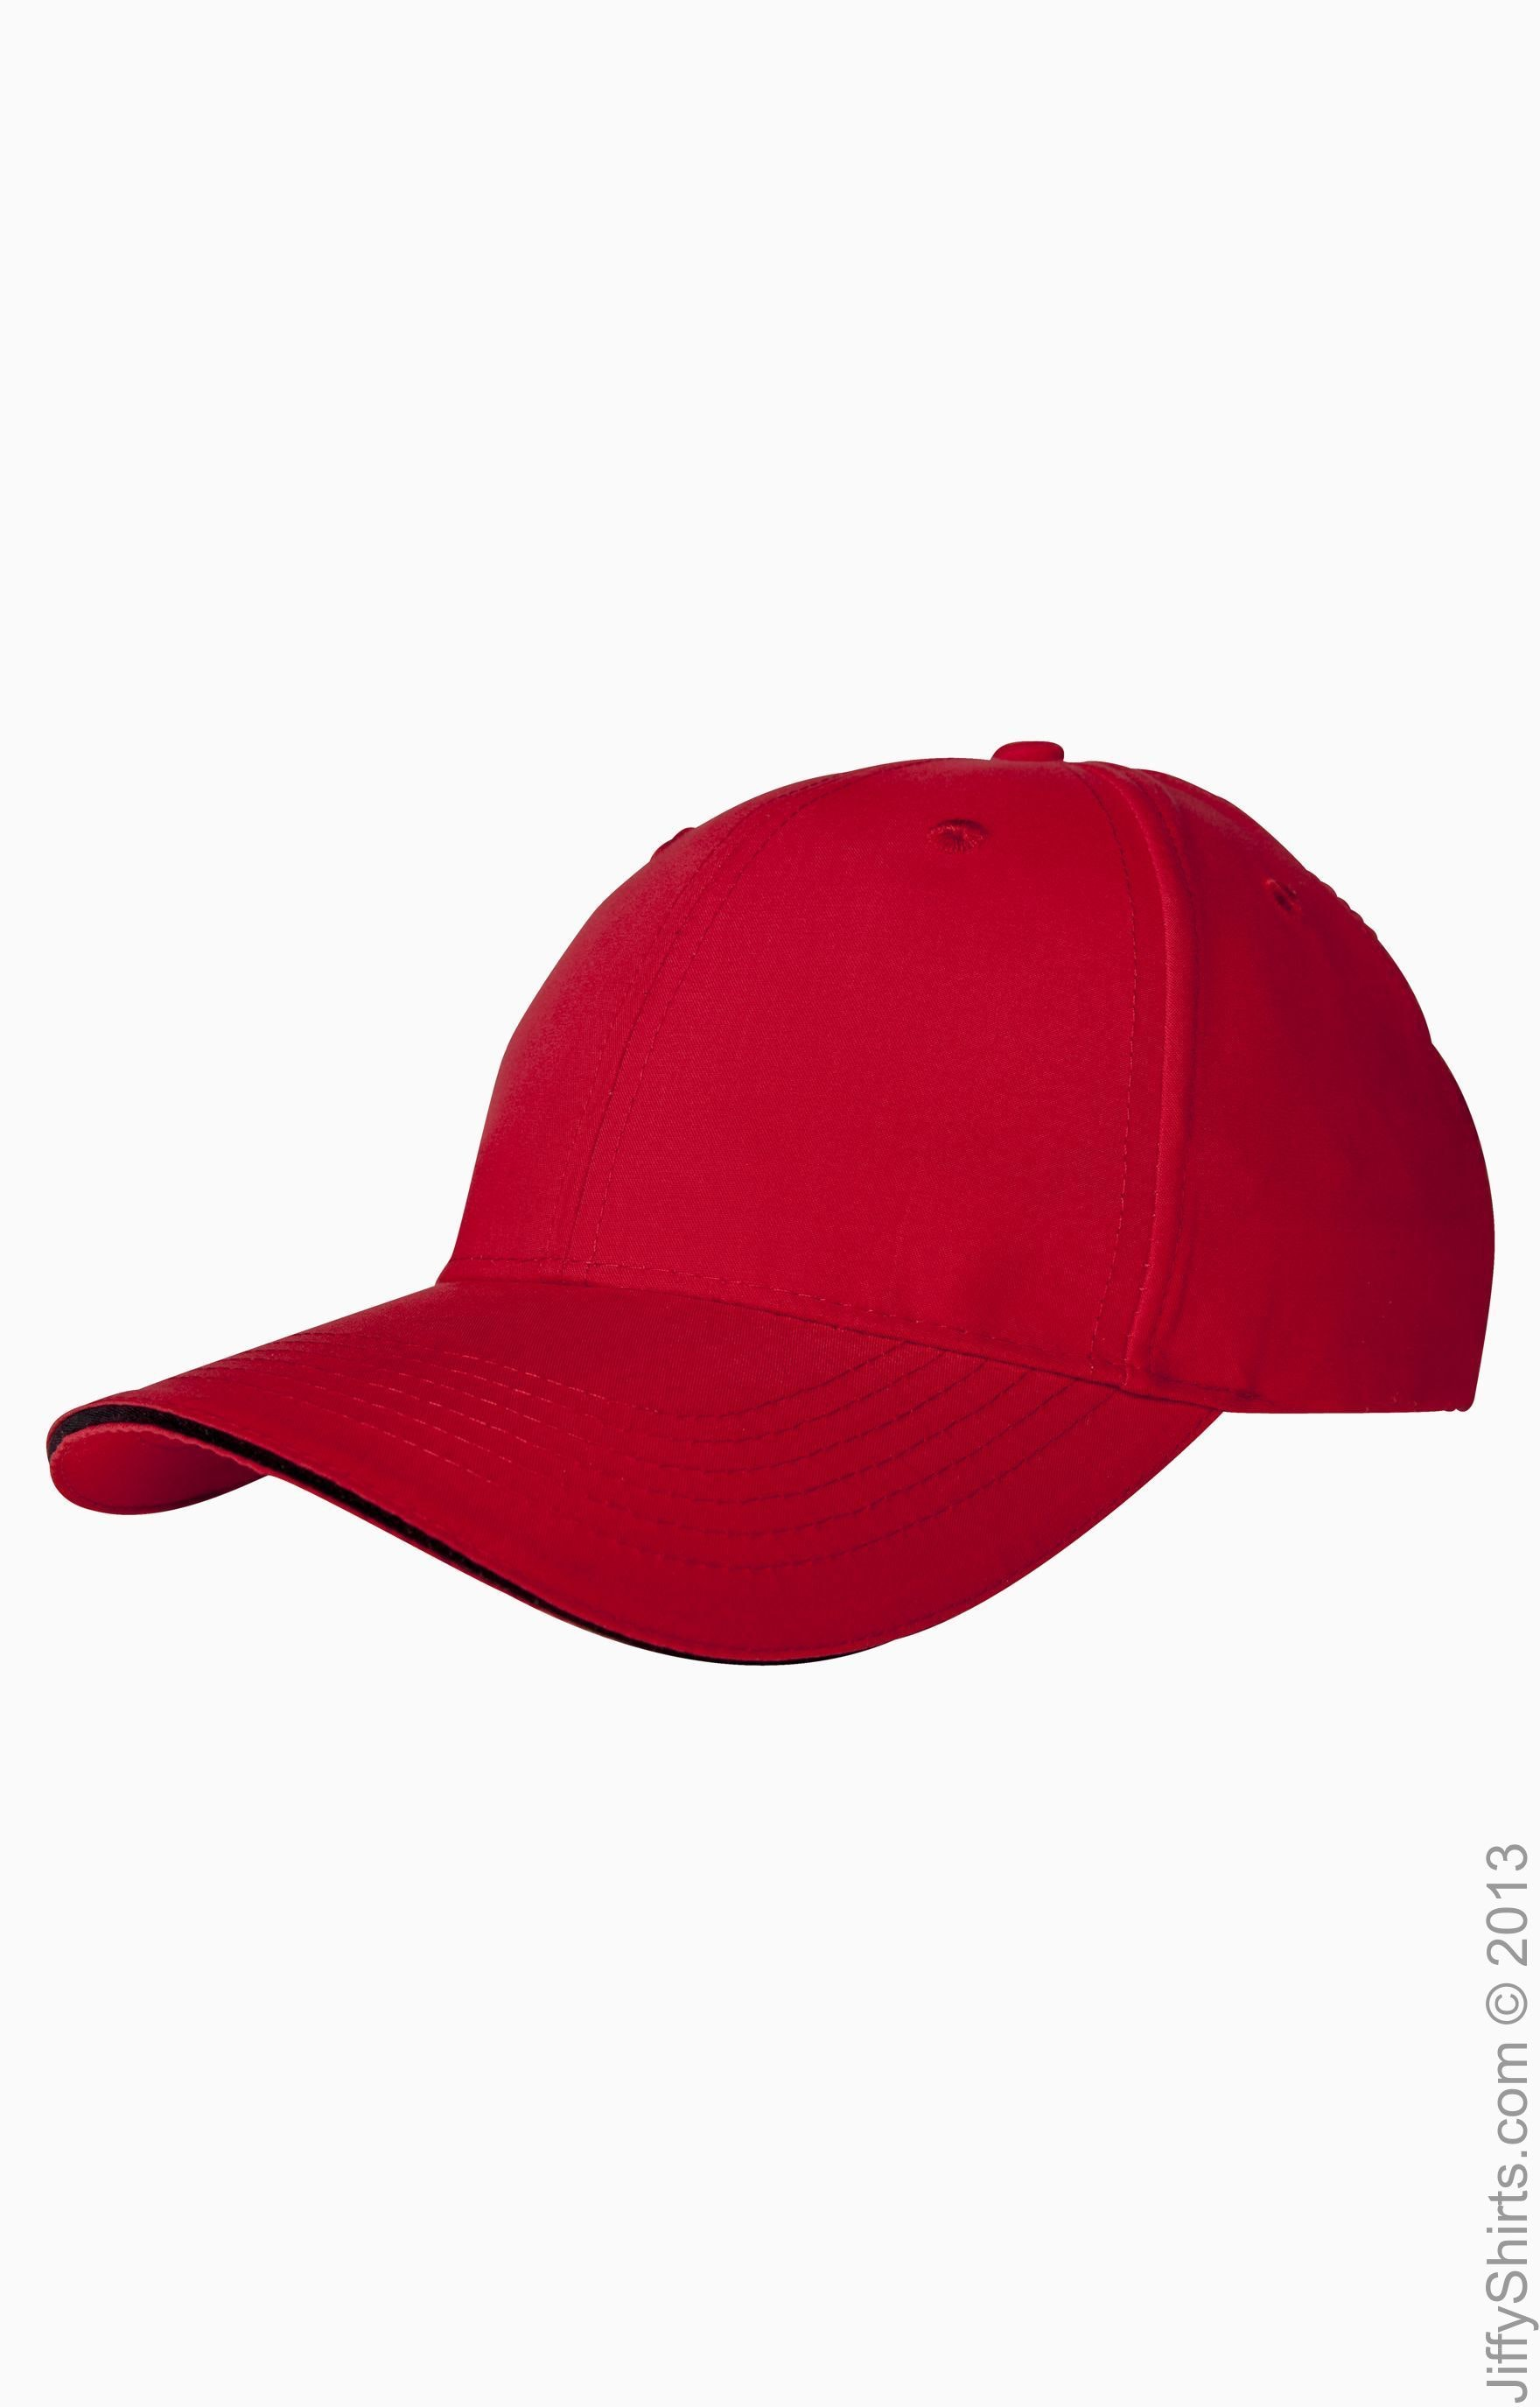 PE102 - Red/Black